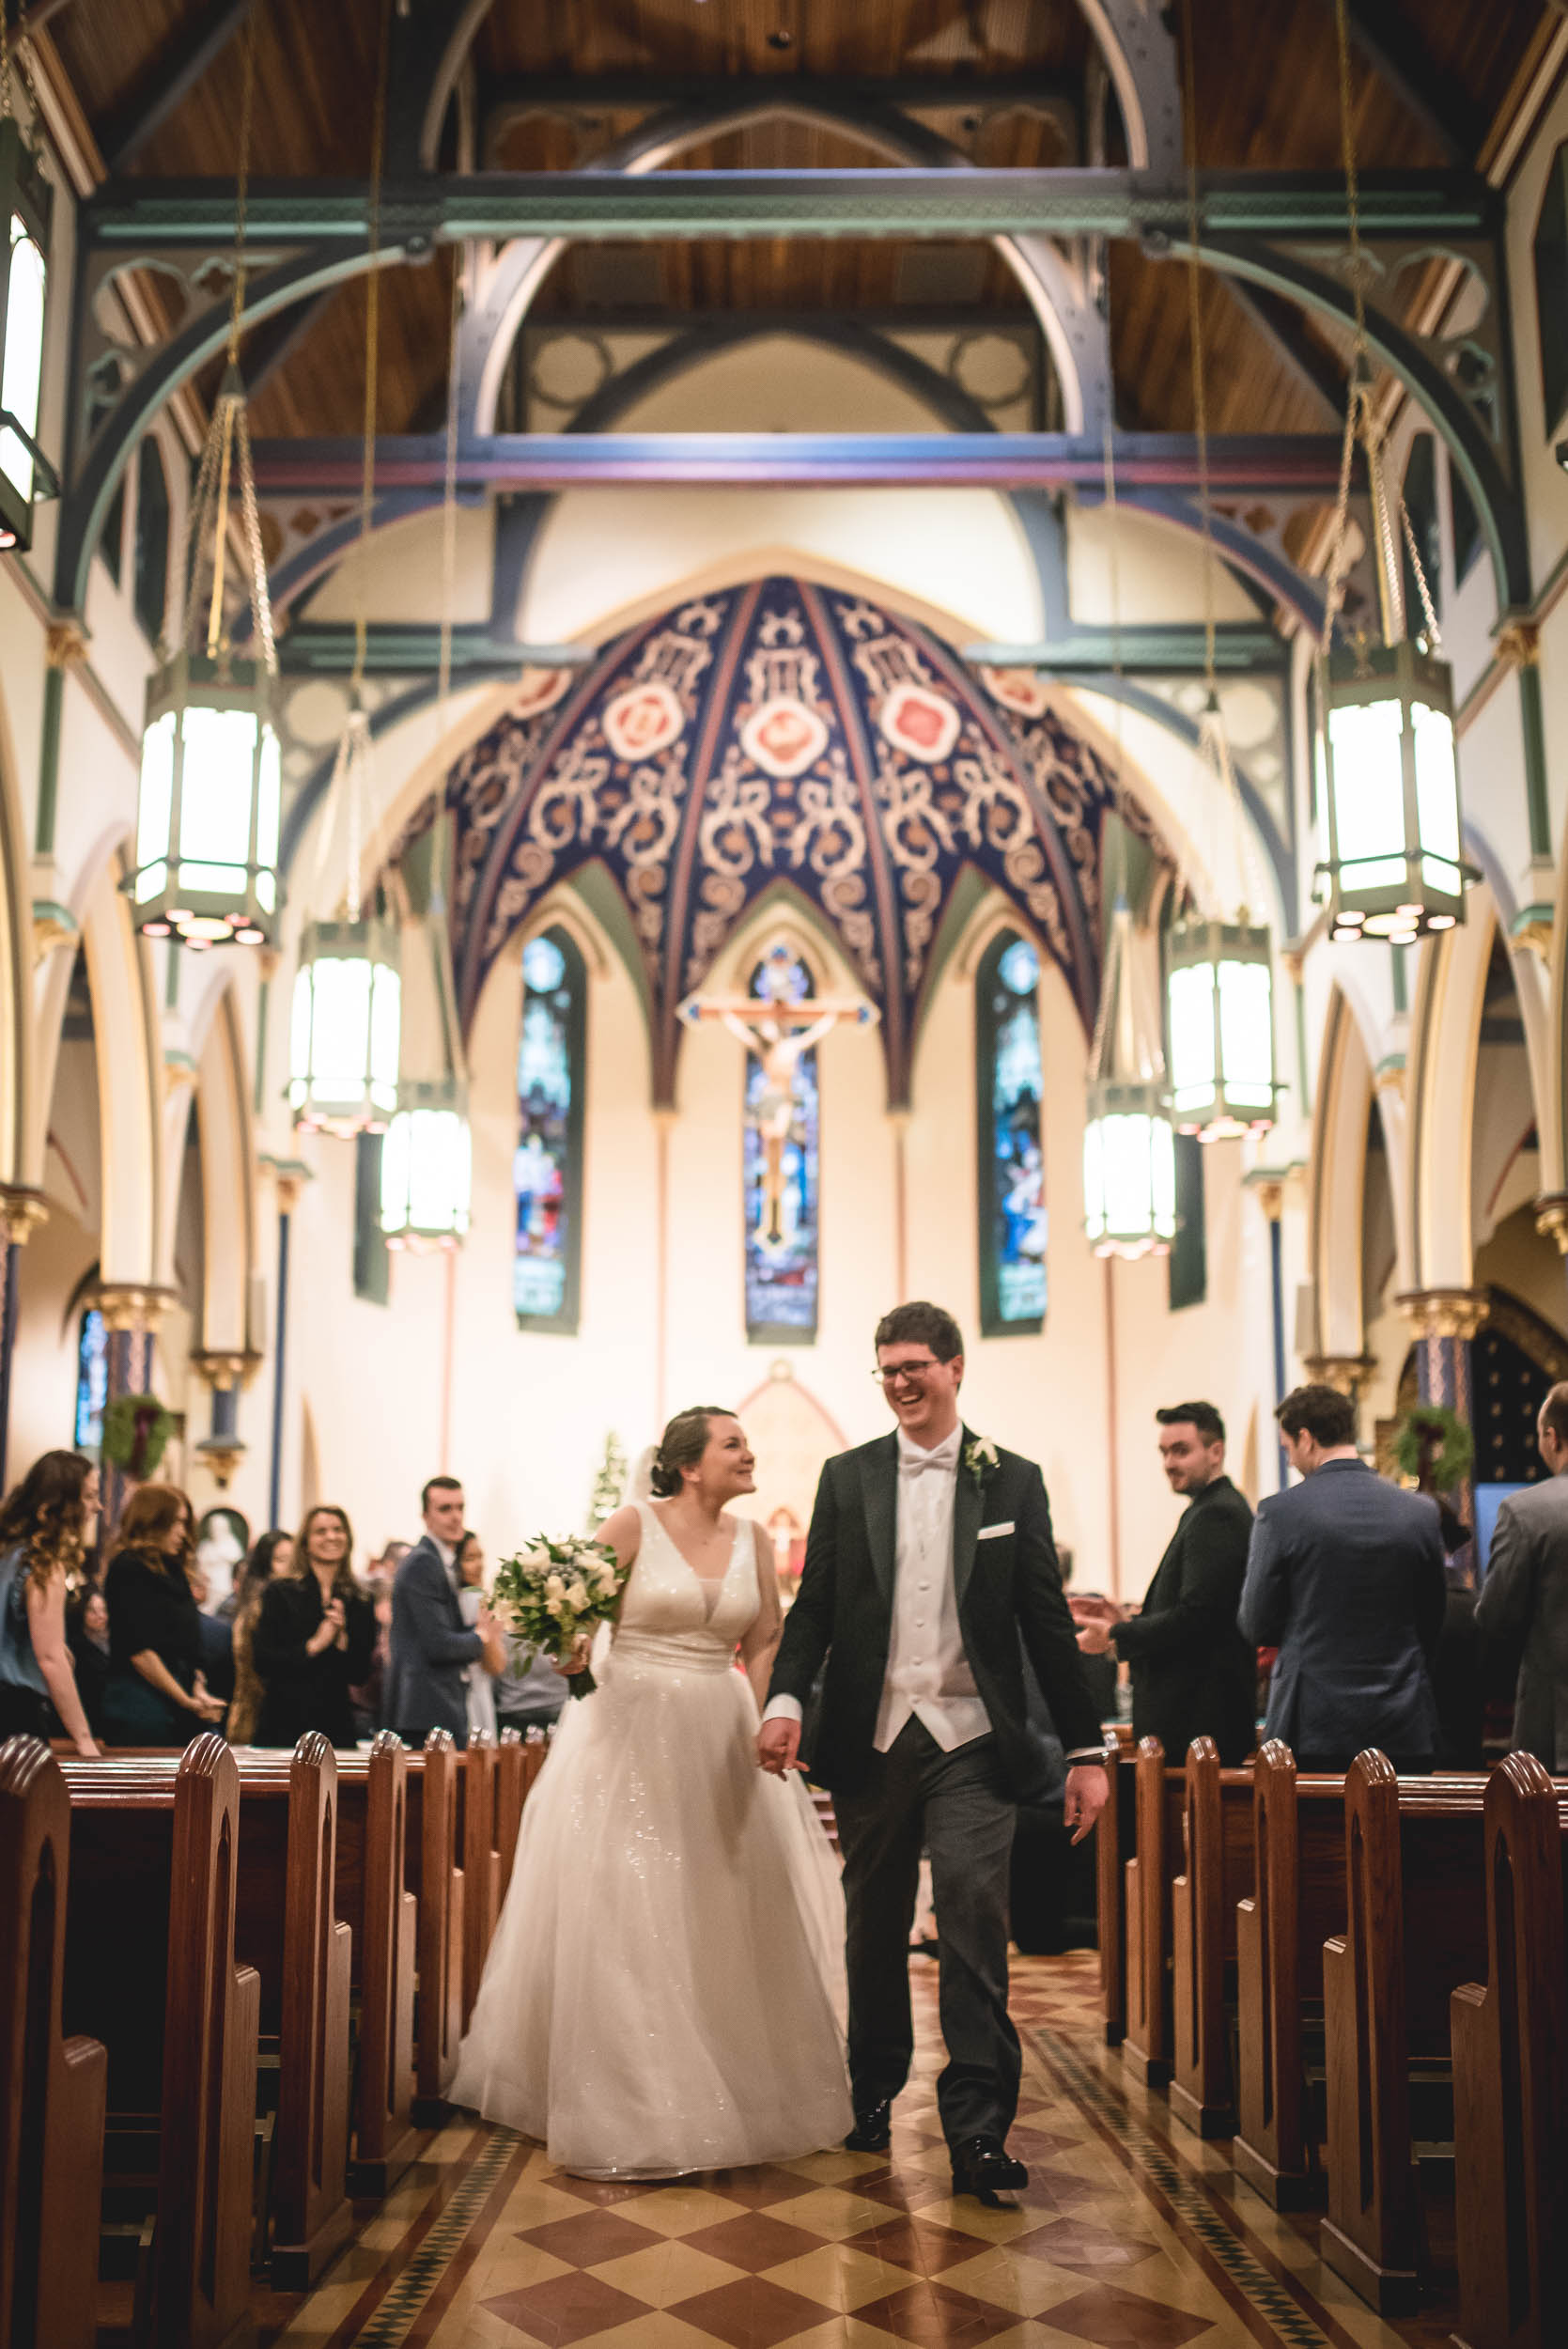 KatieandMathias_Morristown_NewJersey_Wedding_Church_Assumption_Madison_Hotel(38of65).jpg